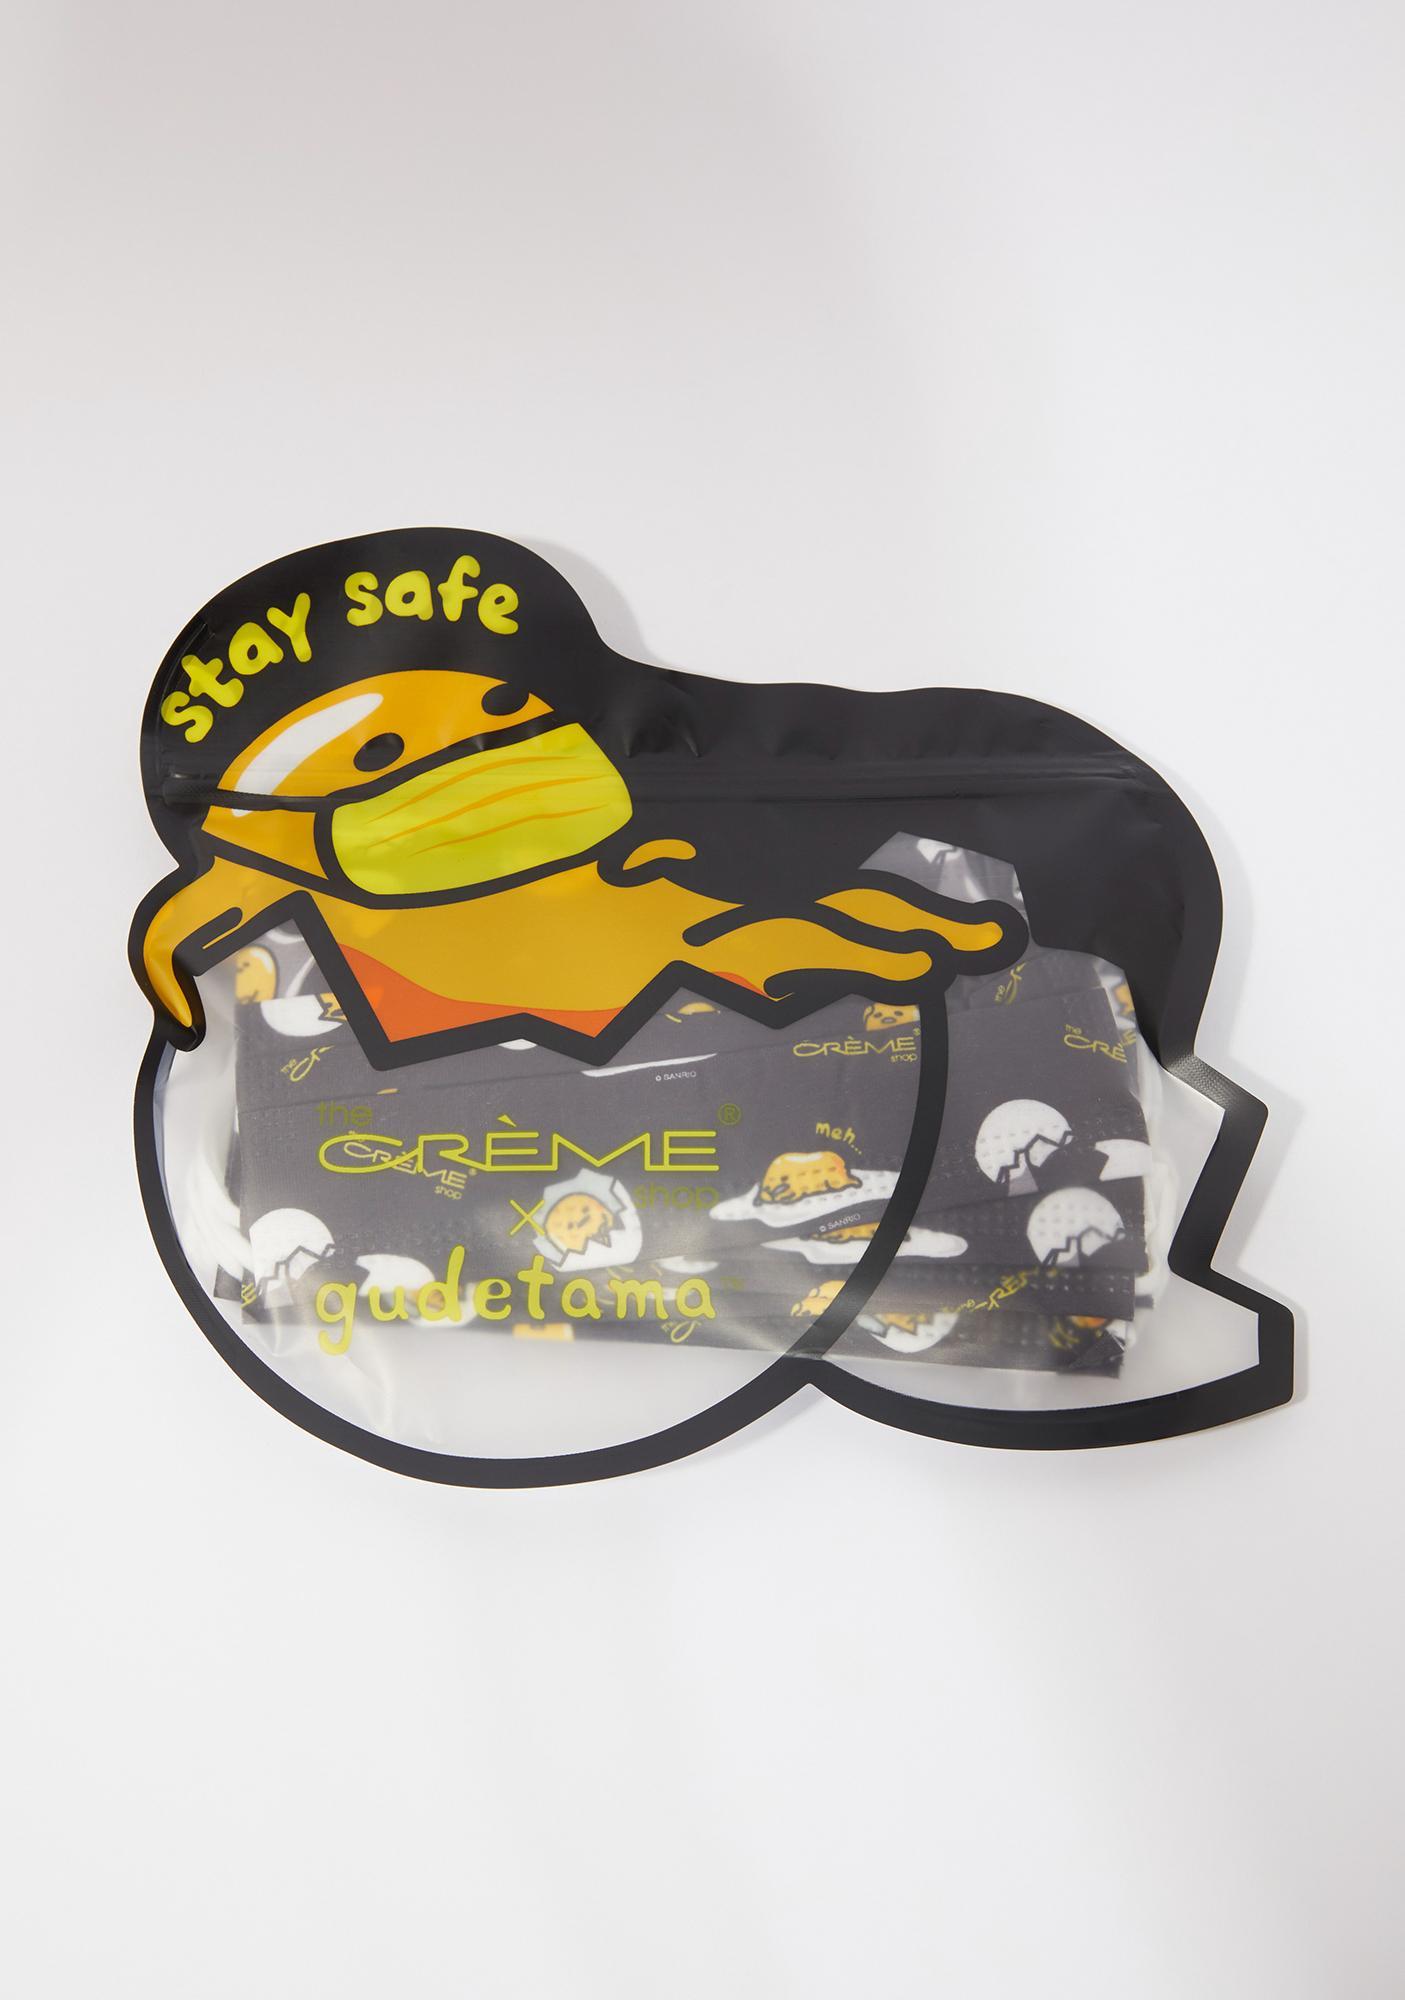 The Crème Shop Gudetama Disposable Protective Face Masks